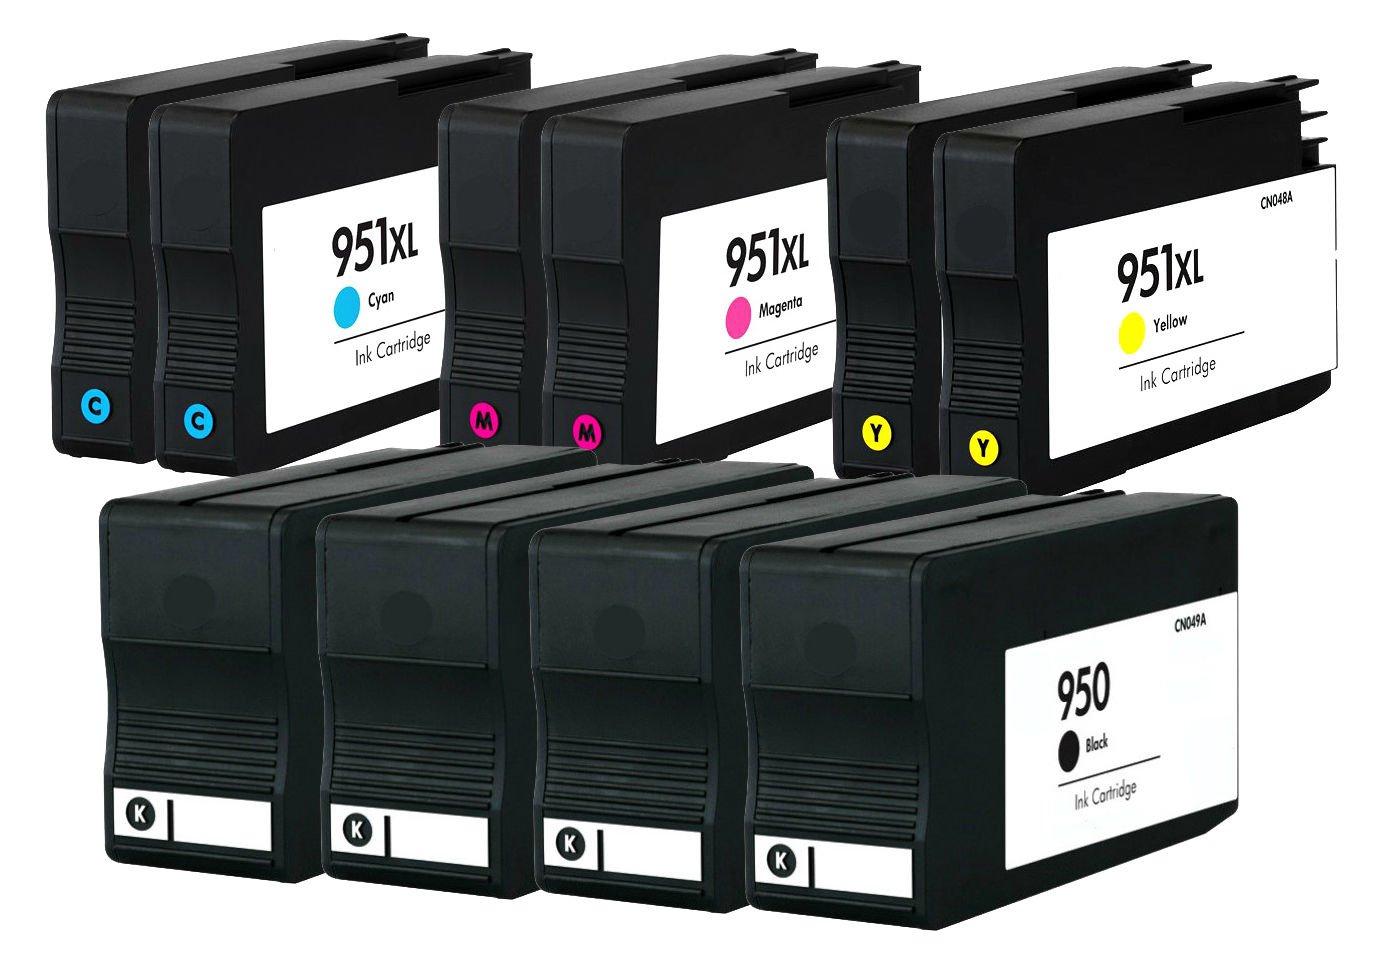 purpplexリサイクルインクカートリッジHP 950のブラックとCMY 951 X LインクカートリッジHP Officejet Pro 8625 251dwインクジェットプリンタ B079Z8CY8W 4 Black- 6 Color 4 Black- 6 Color